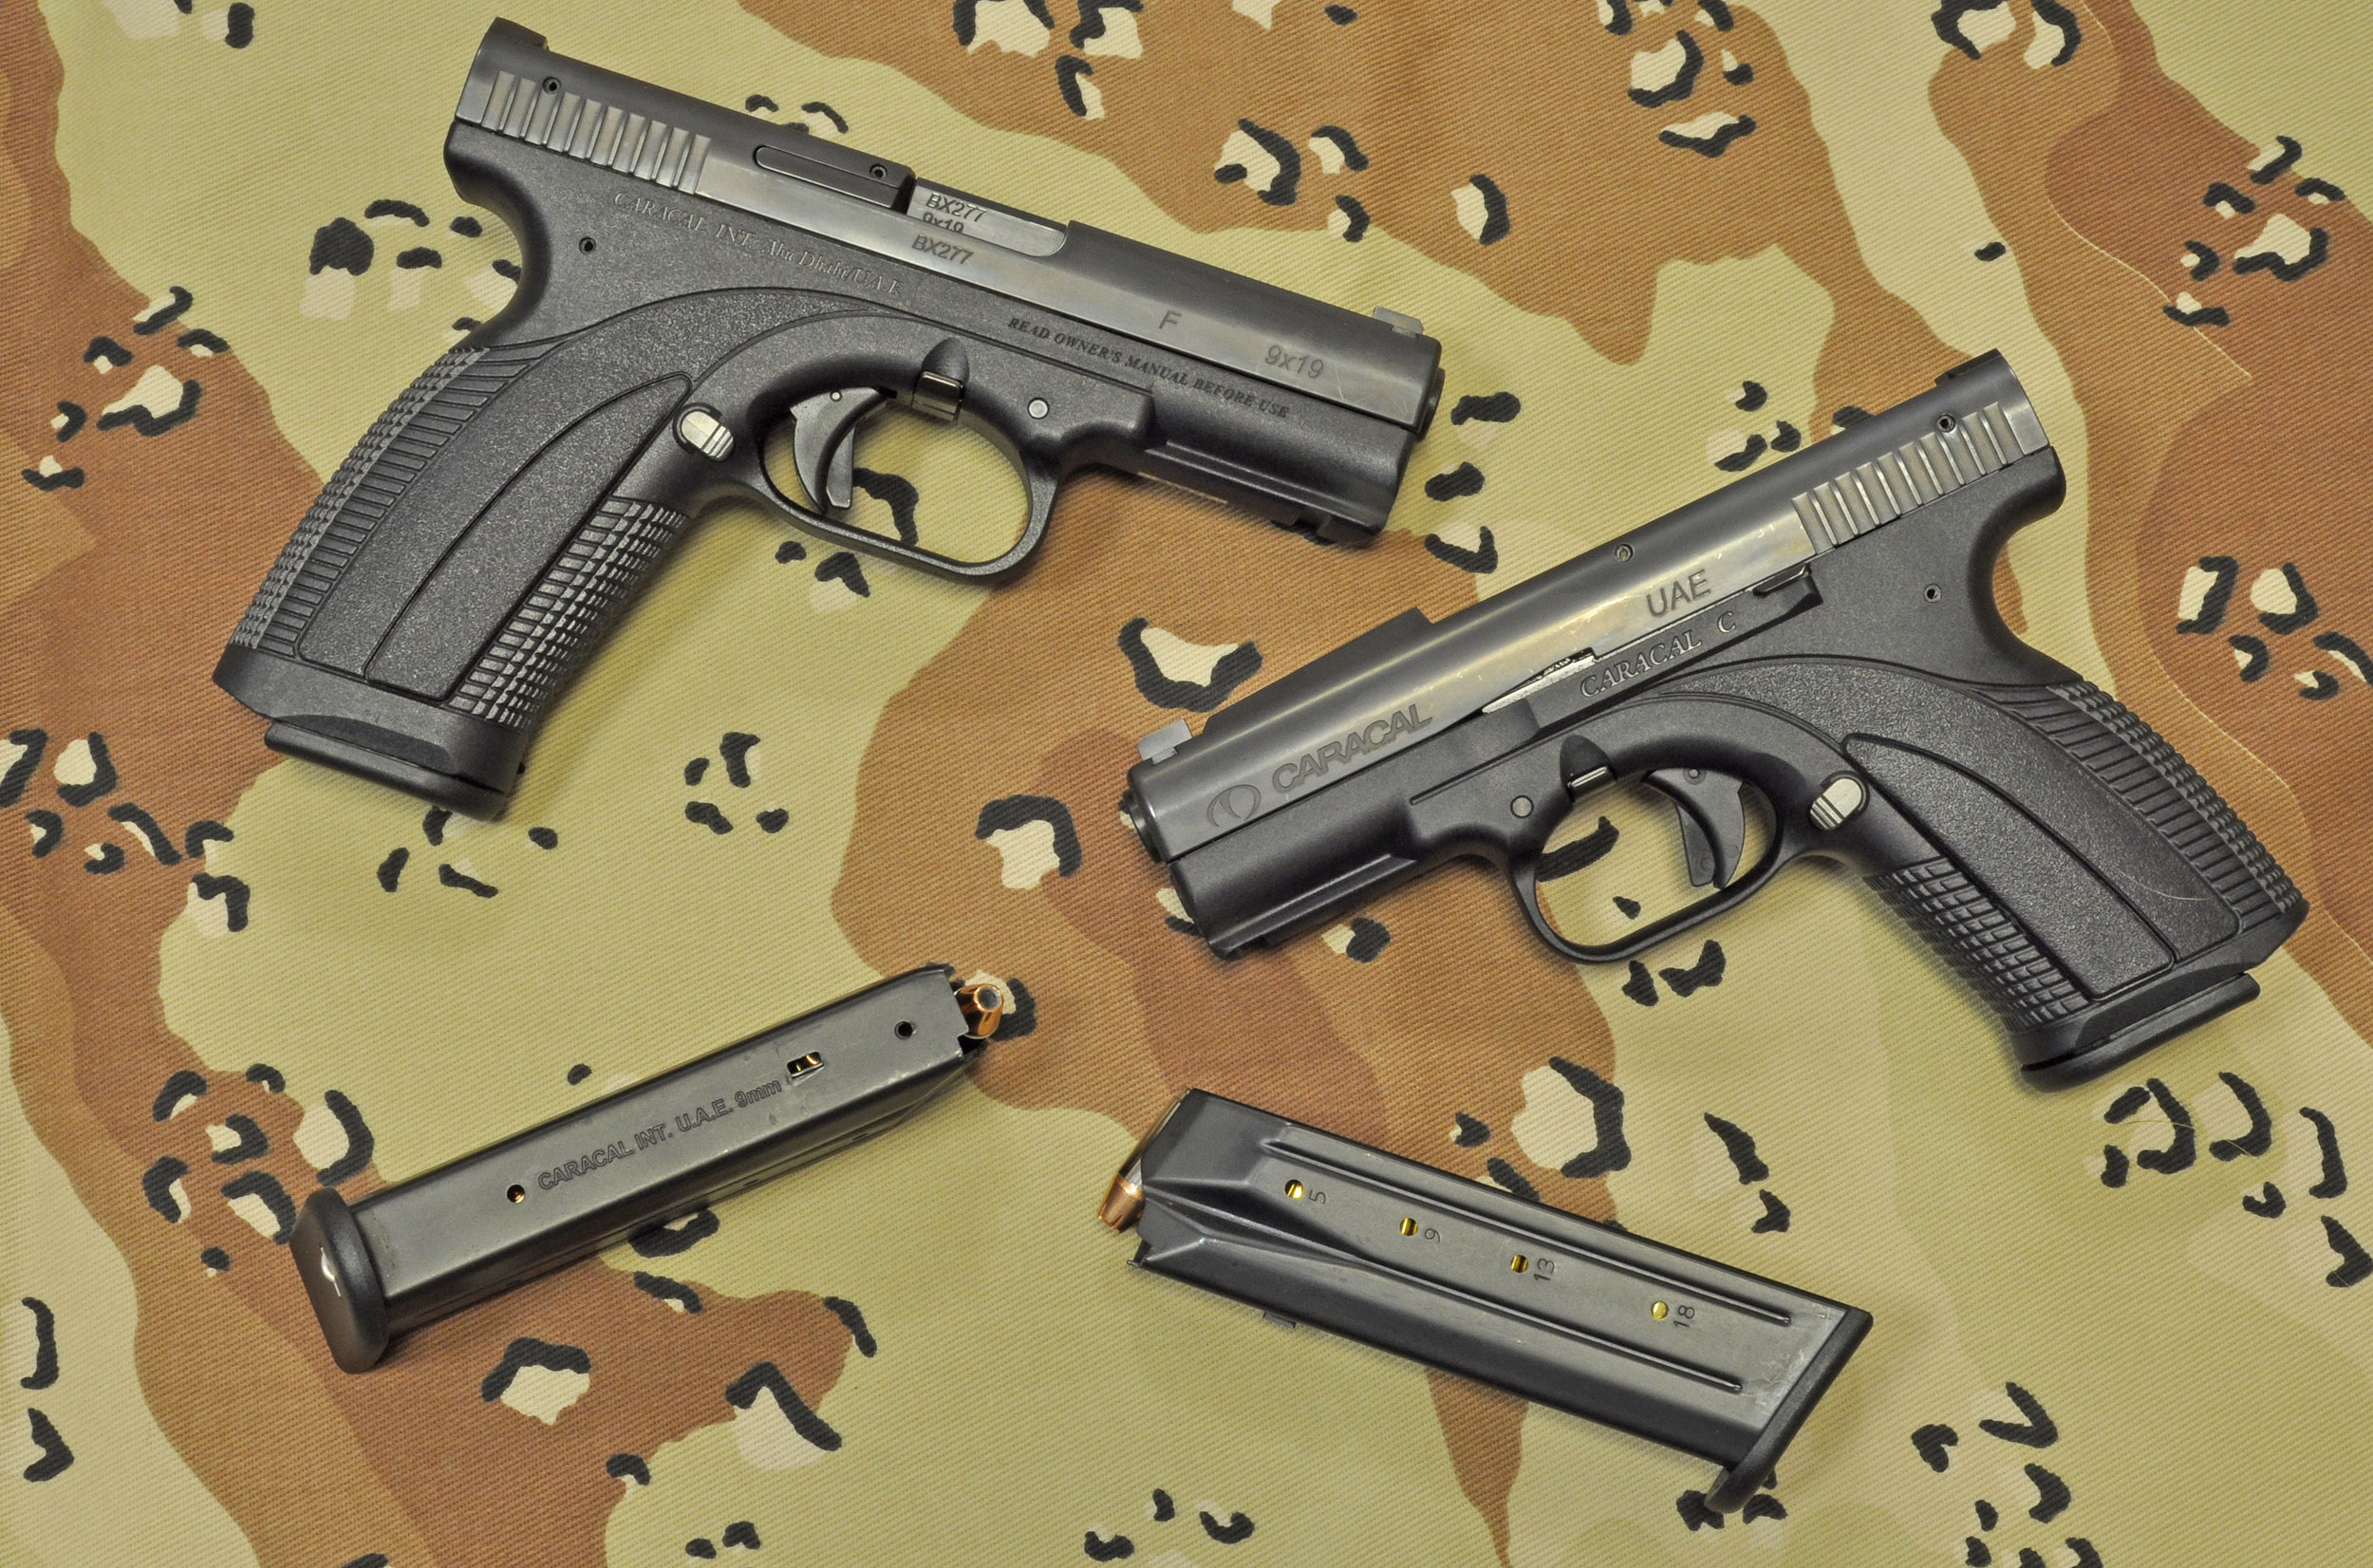 The Caracal Pistol